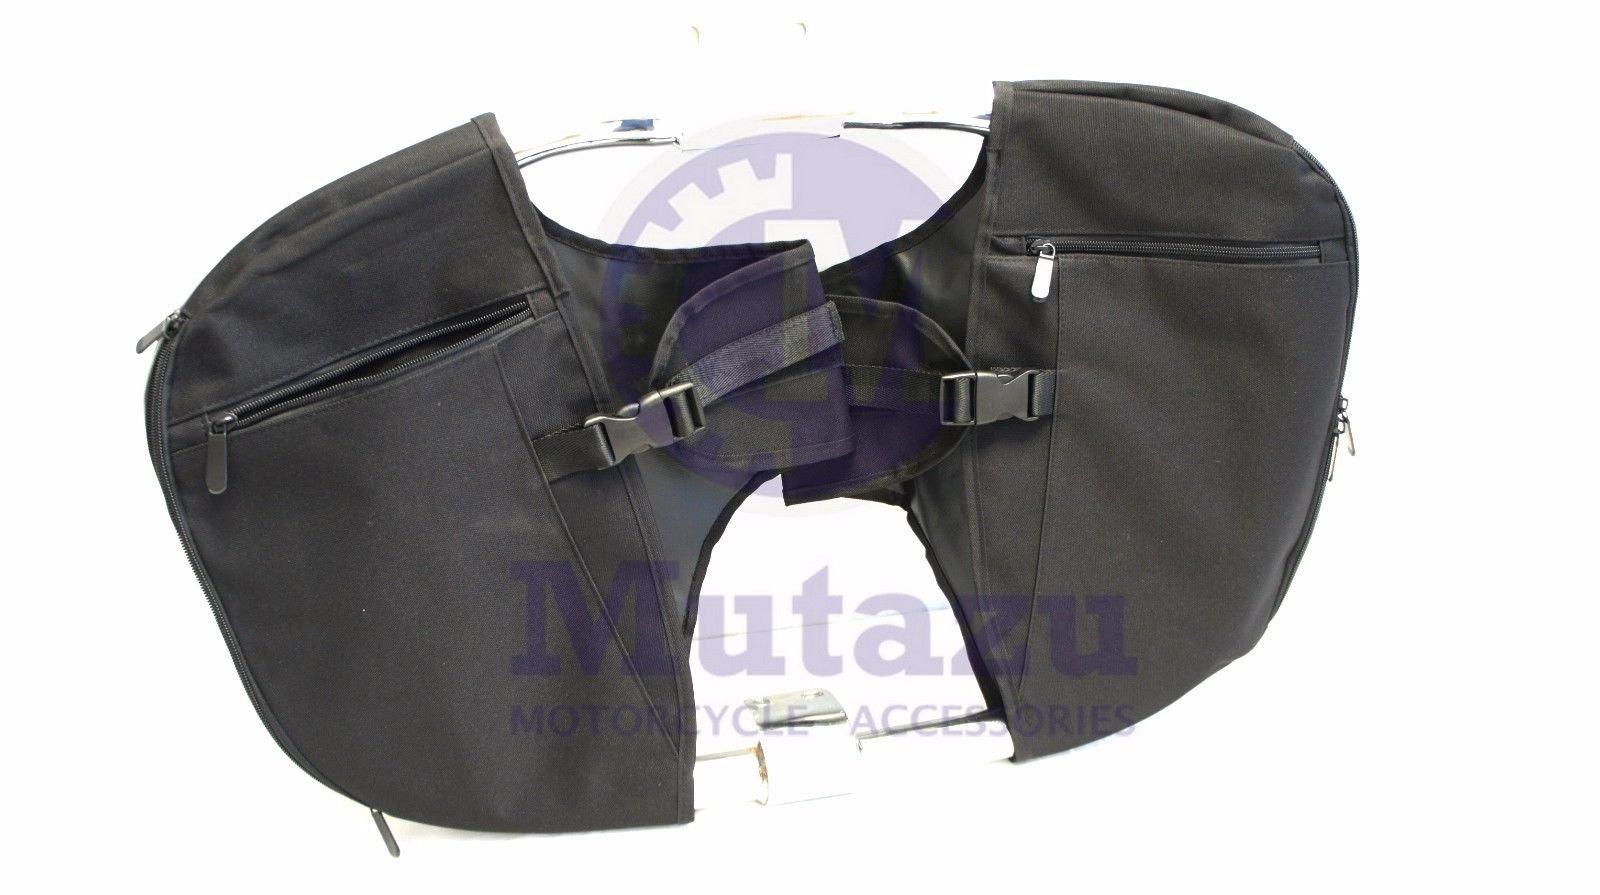 Mutazu Soft Lowers Chaps Leg Warmer for Harley Touring Model OEM Engine Guard by Mutazu